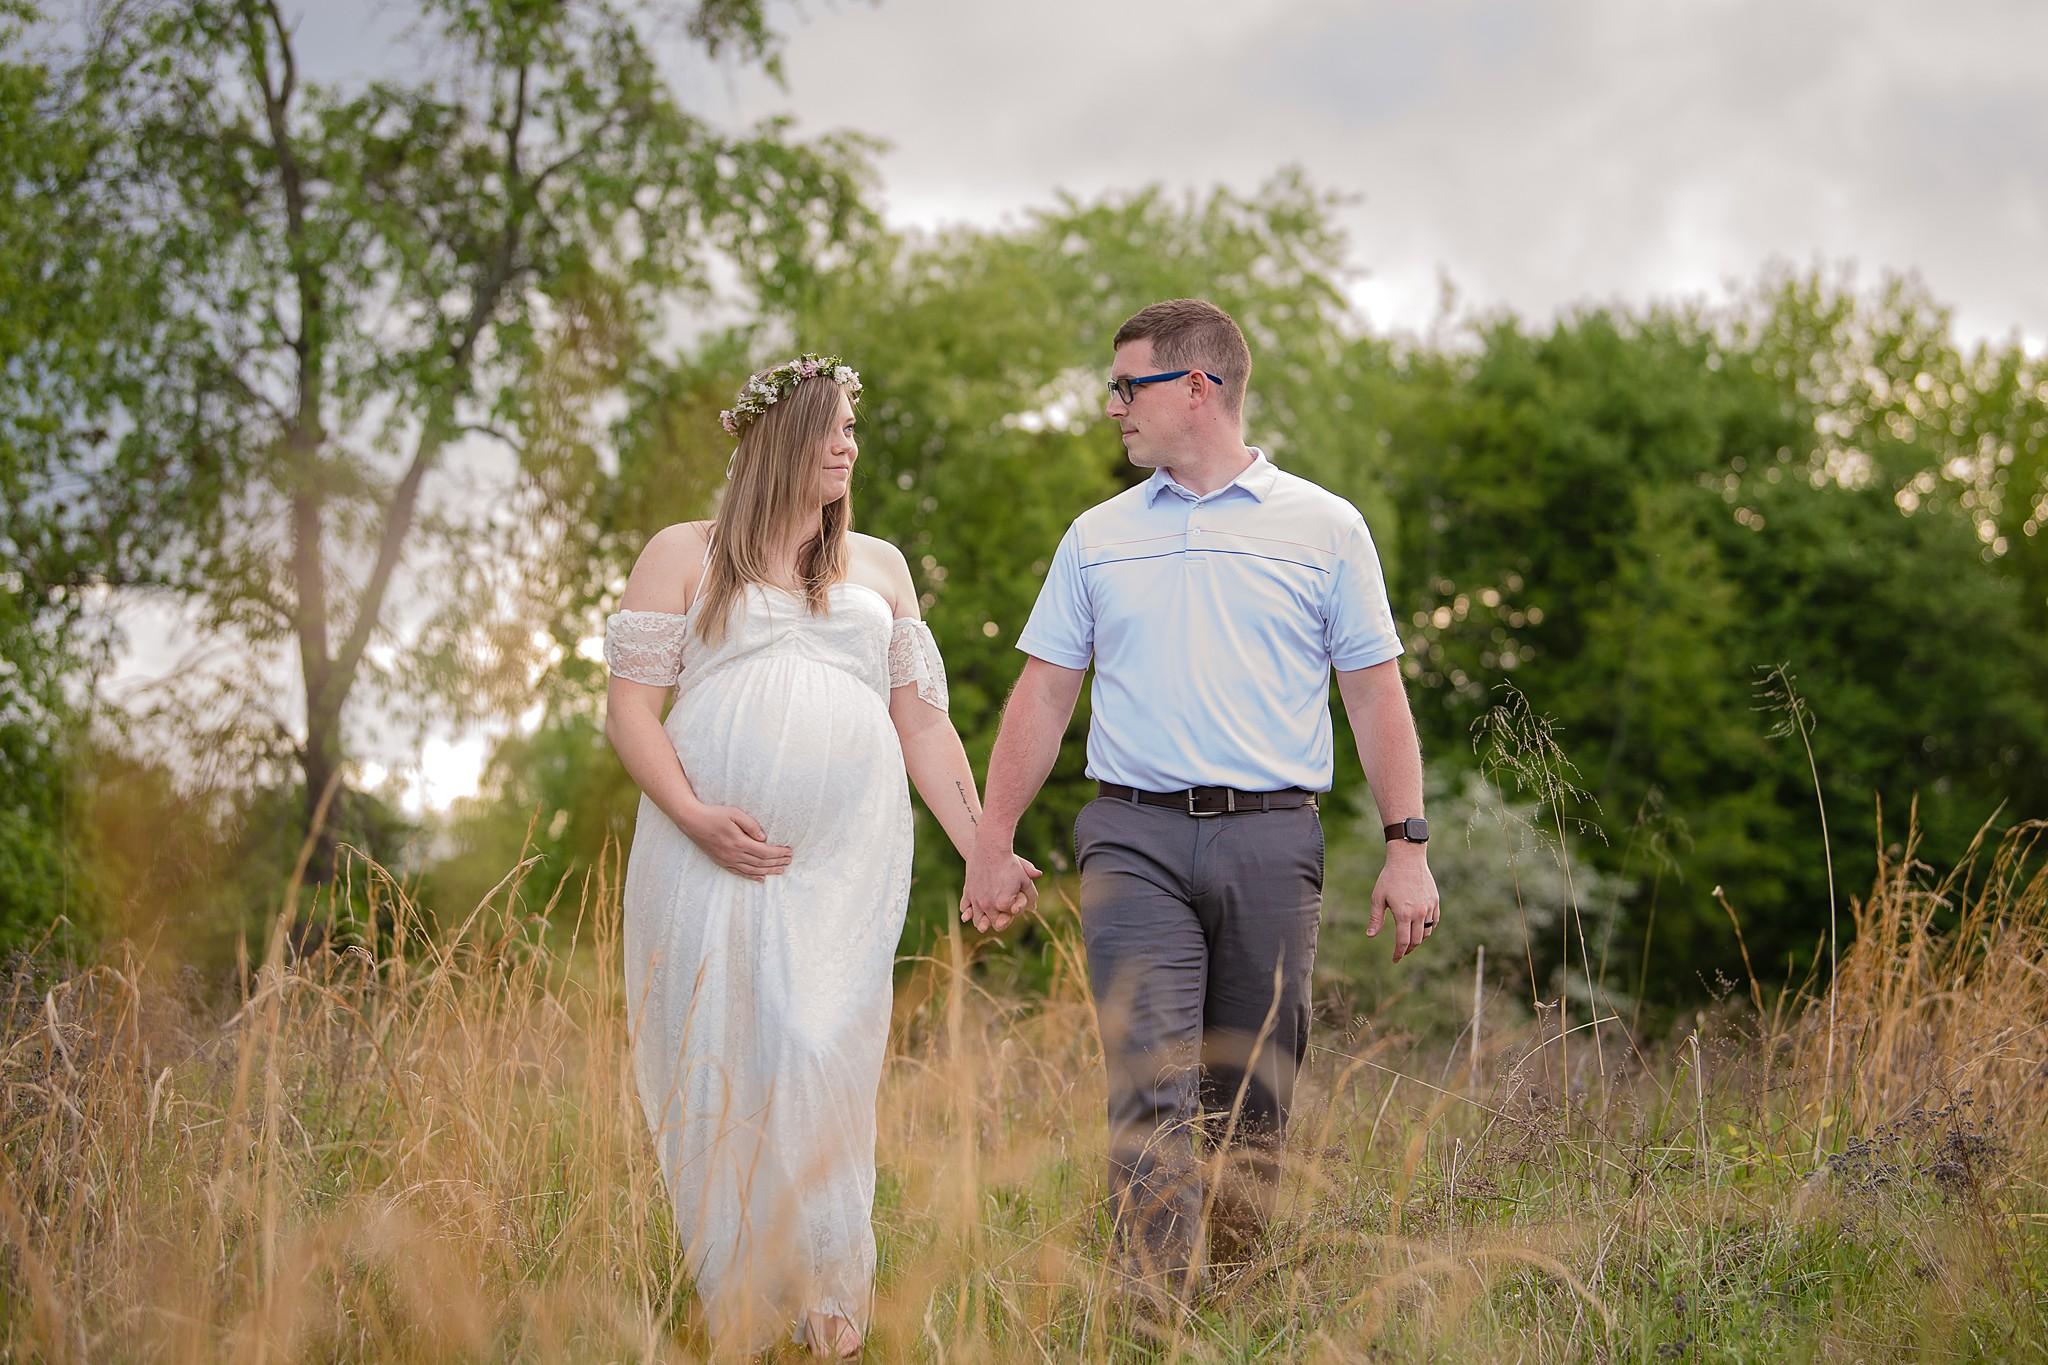 expectant parents holding hands